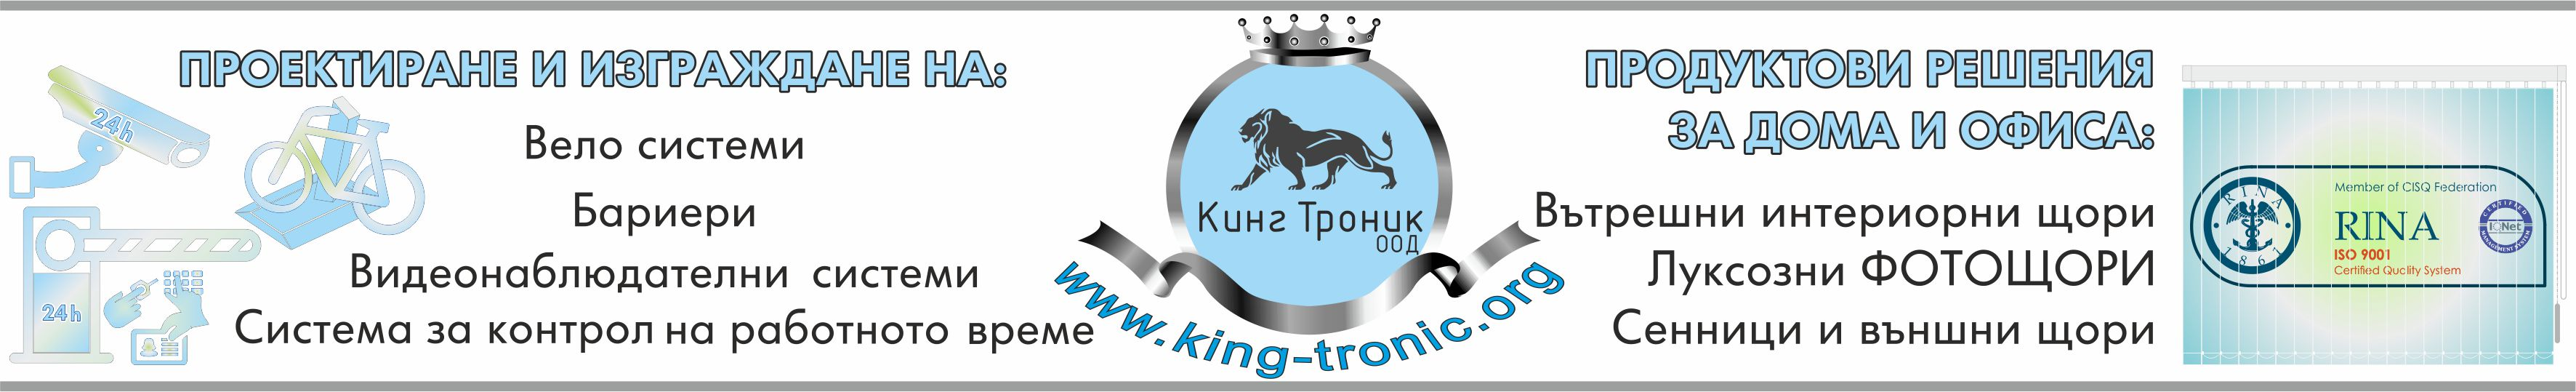 http://king-tronic.org/за нас/